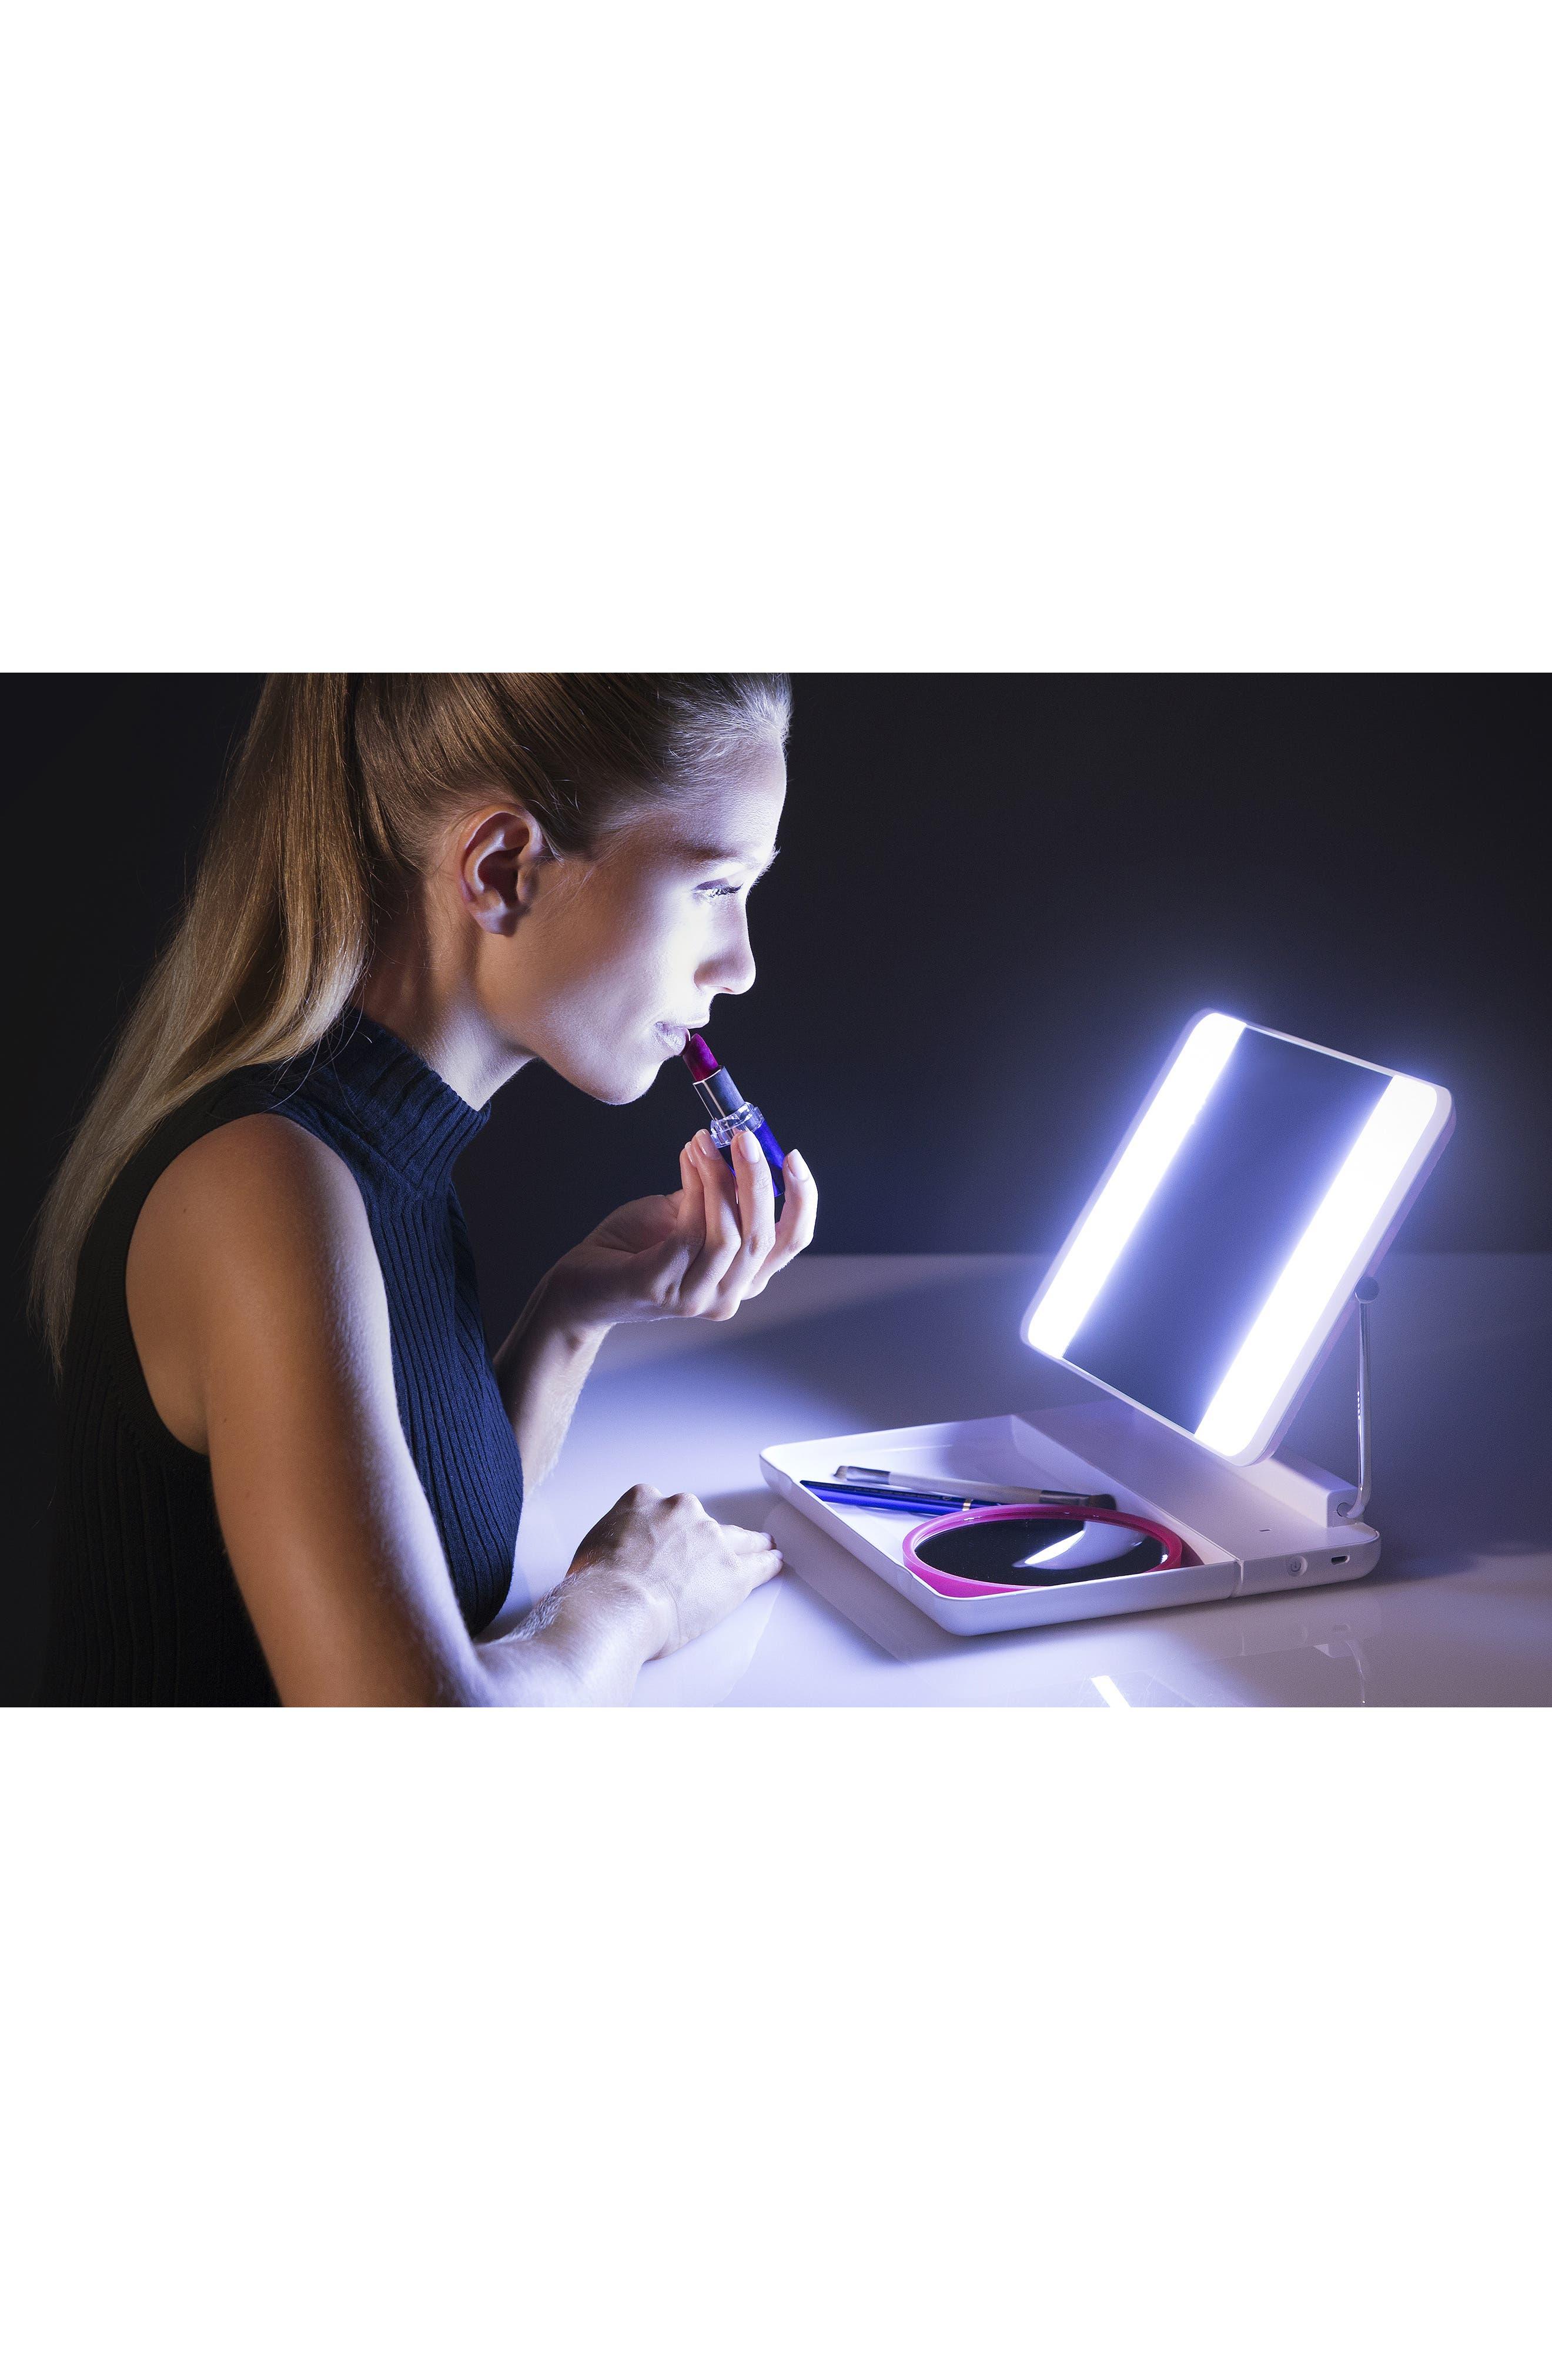 JOI Spotlite HD Diamond Makeup Mirror in Hot Blush,                             Alternate thumbnail 5, color,                             000